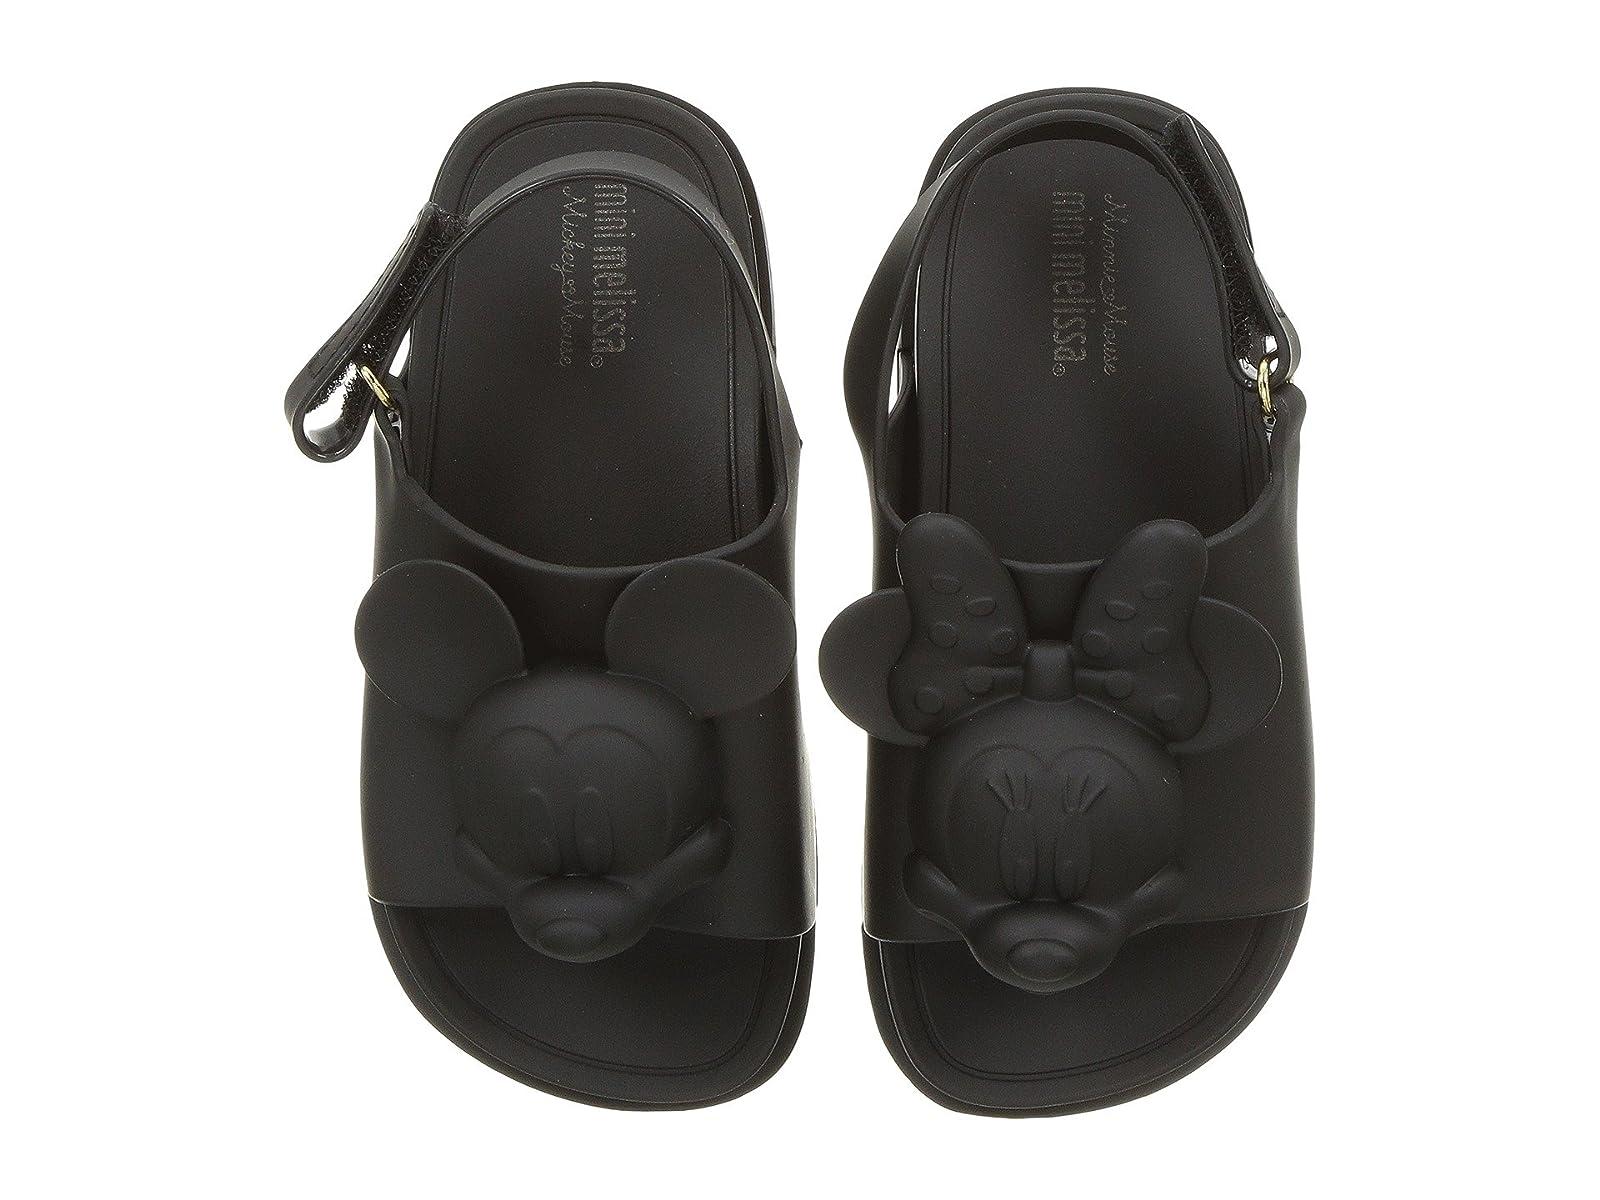 Mini Melissa Mini Beach Slide Sandal + Disney (Toddler/Little Kid)Atmospheric grades have affordable shoes